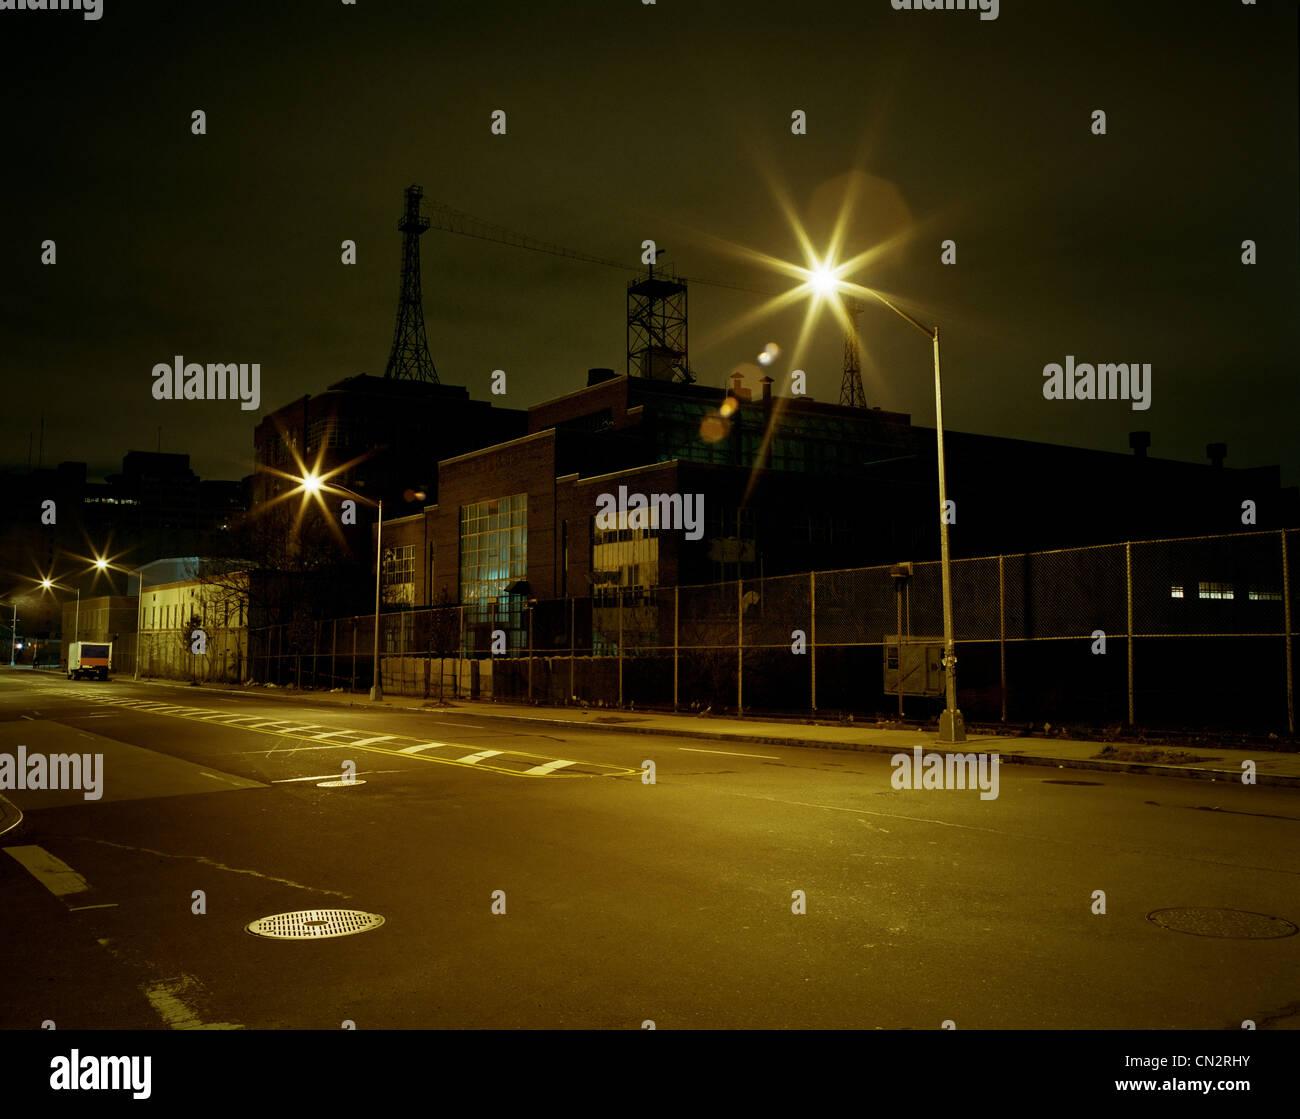 Street and Navy Yard at night, Brooklyn, New York, USA - Stock Image